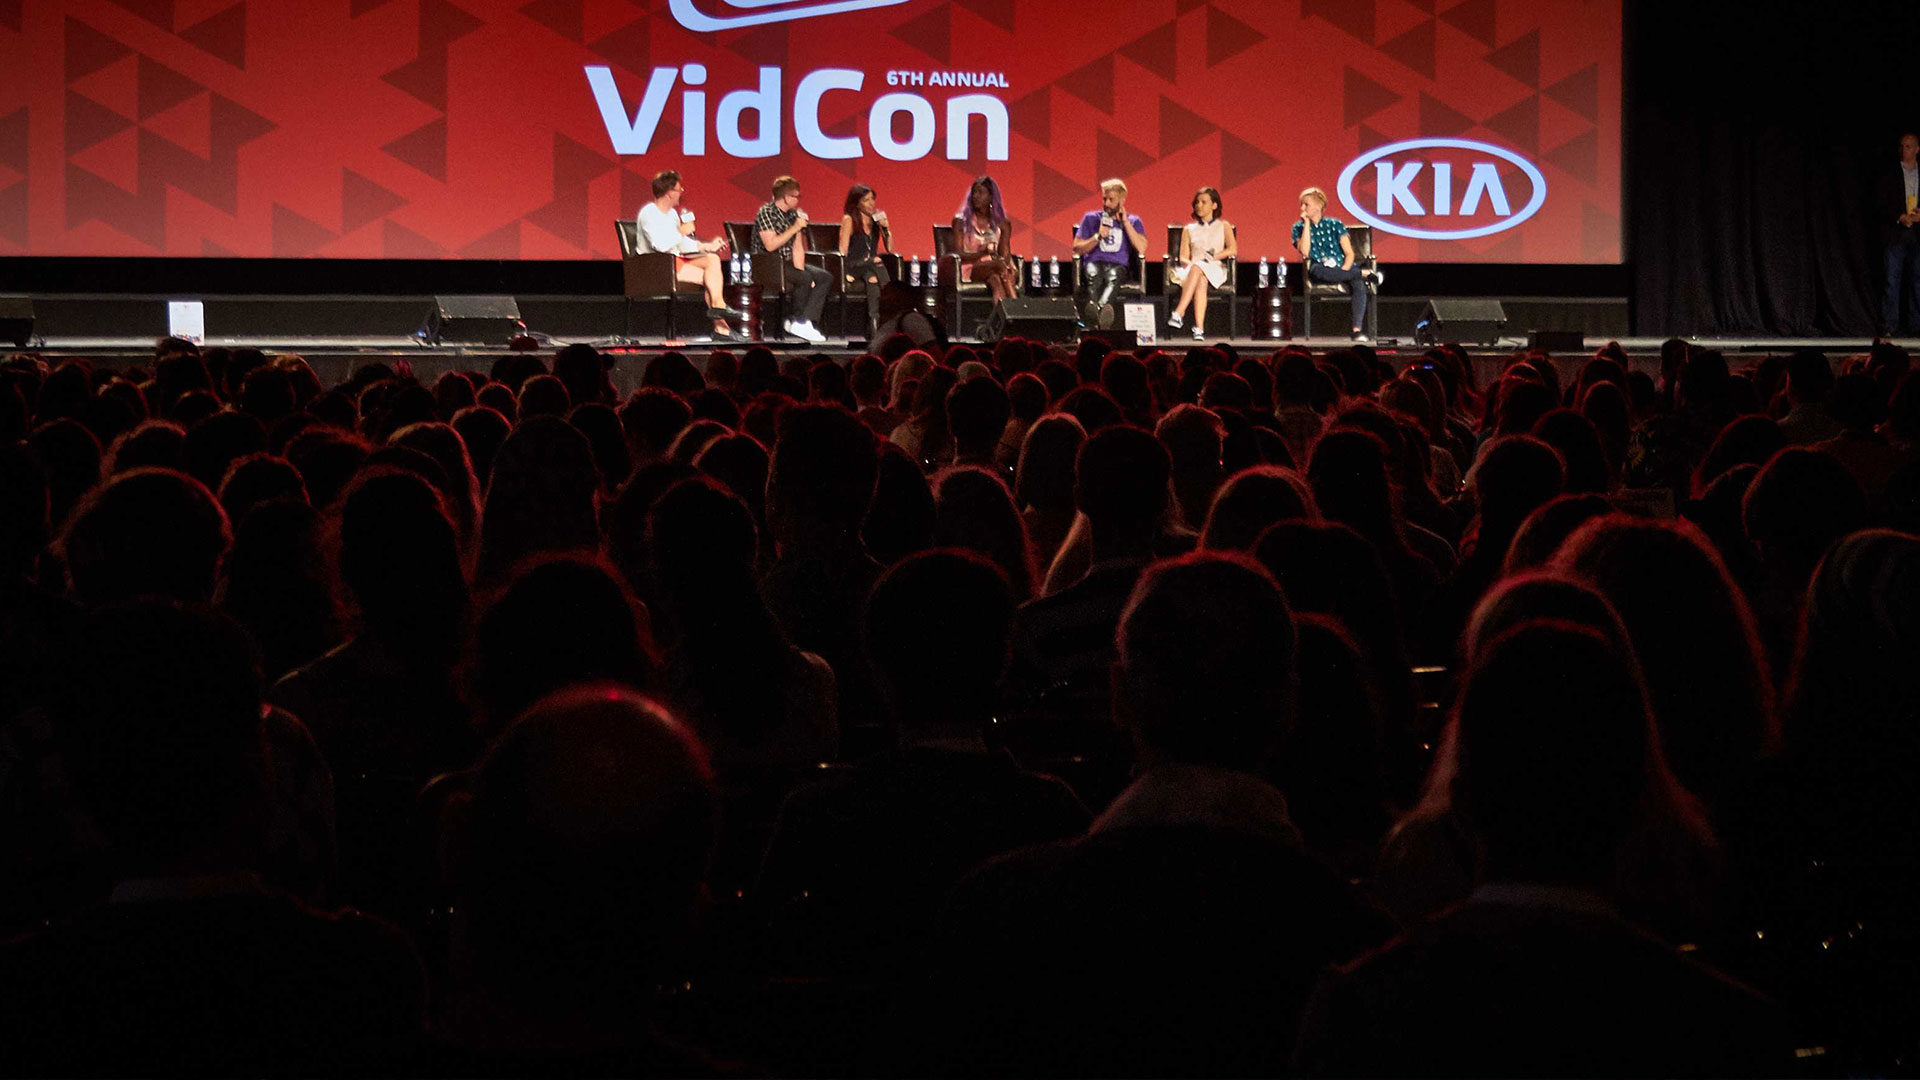 VidCon is a creative revolution